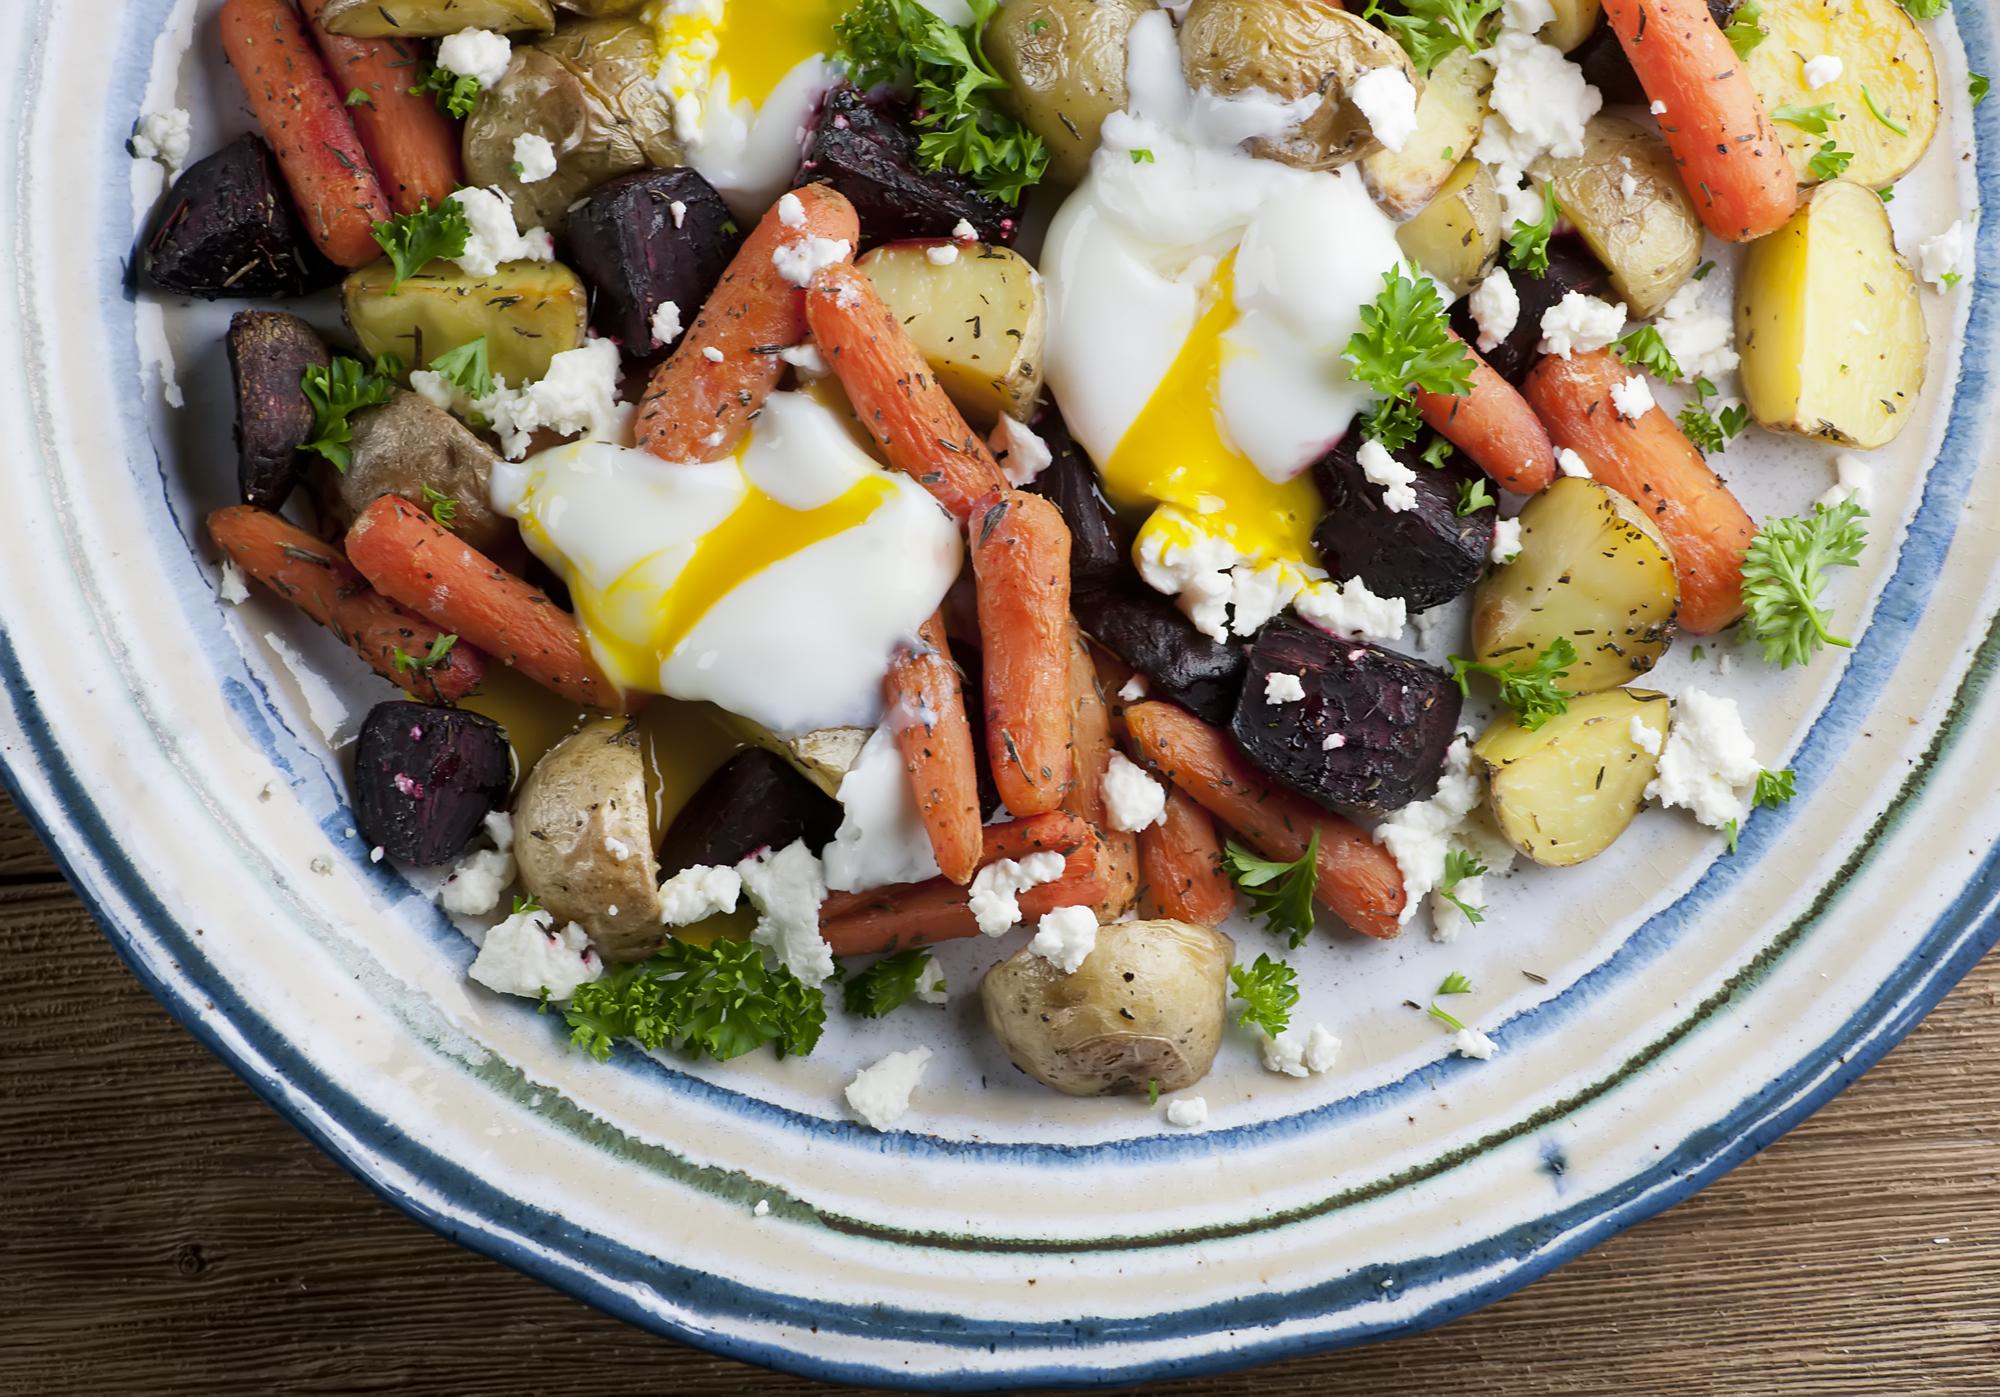 egg salad with roasted vegetables